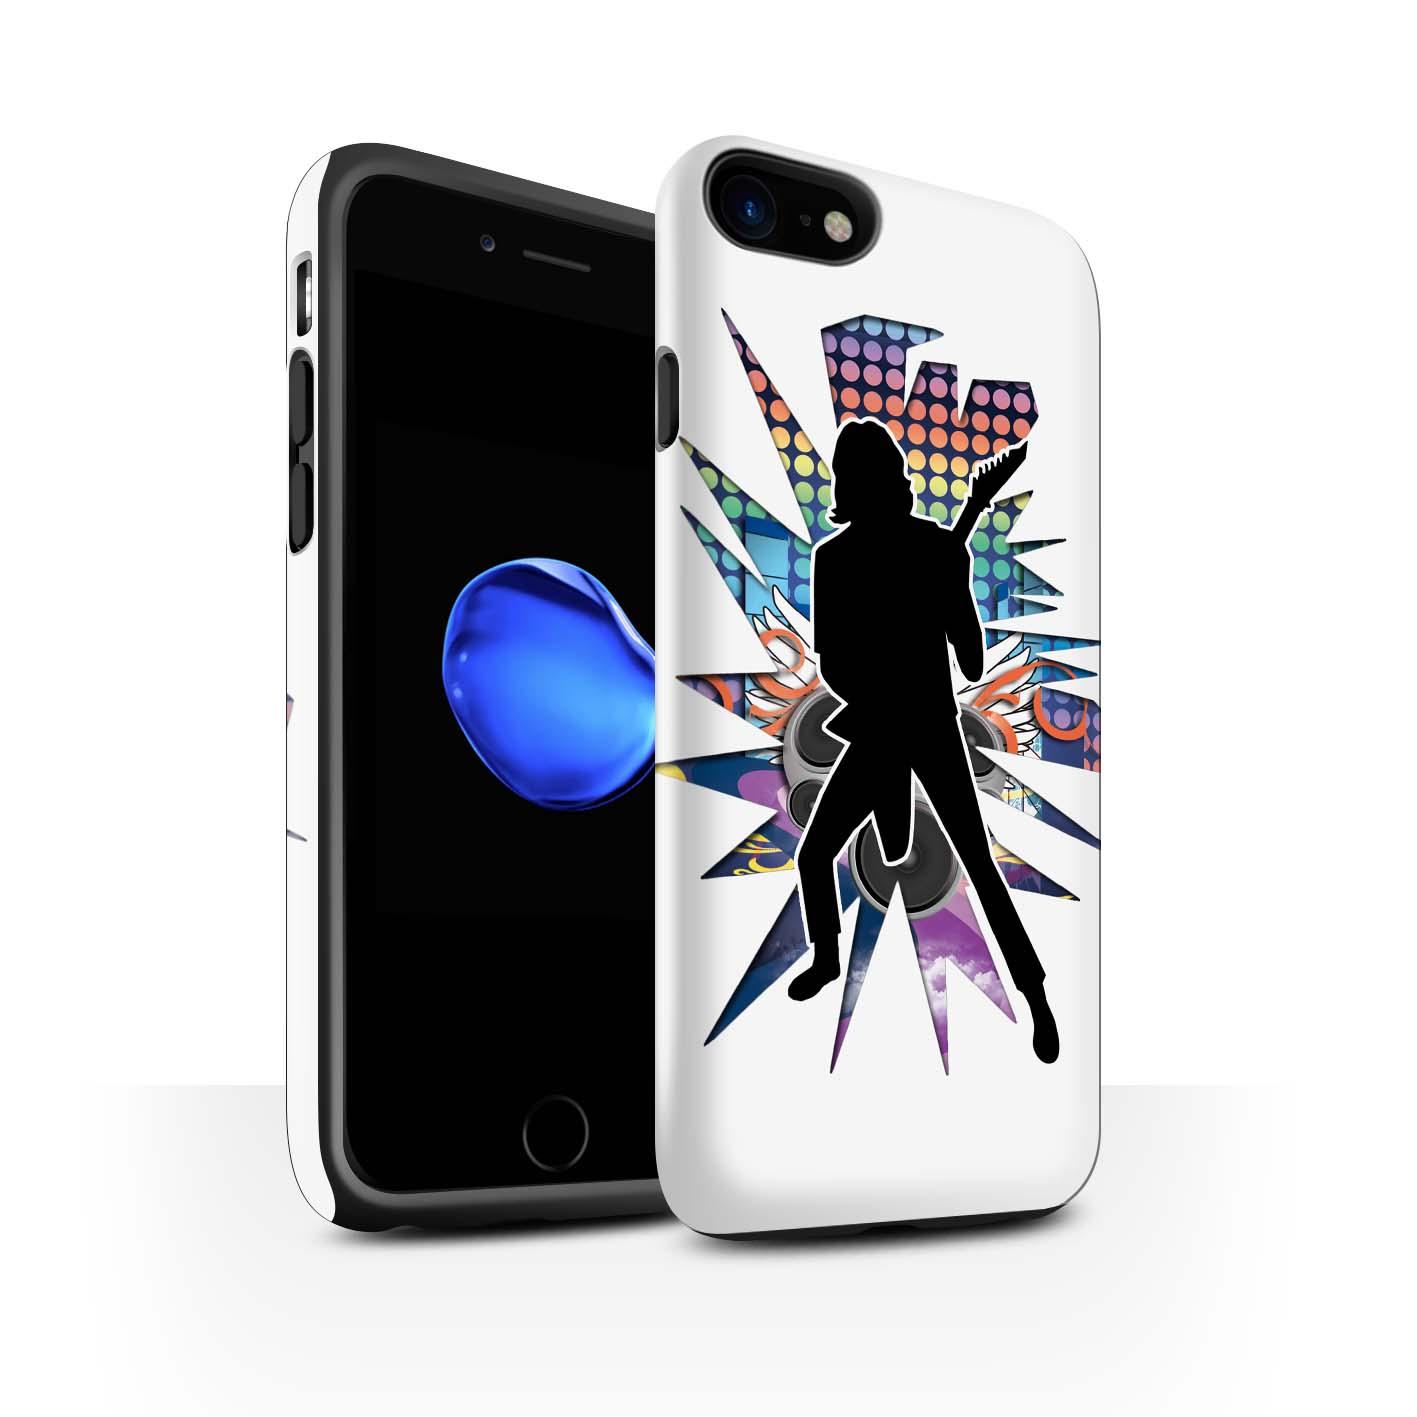 Robuste-Matte-Antichoc-Etui-STUFF4-pour-Apple-iPhone-7-Rock-Star-Pose